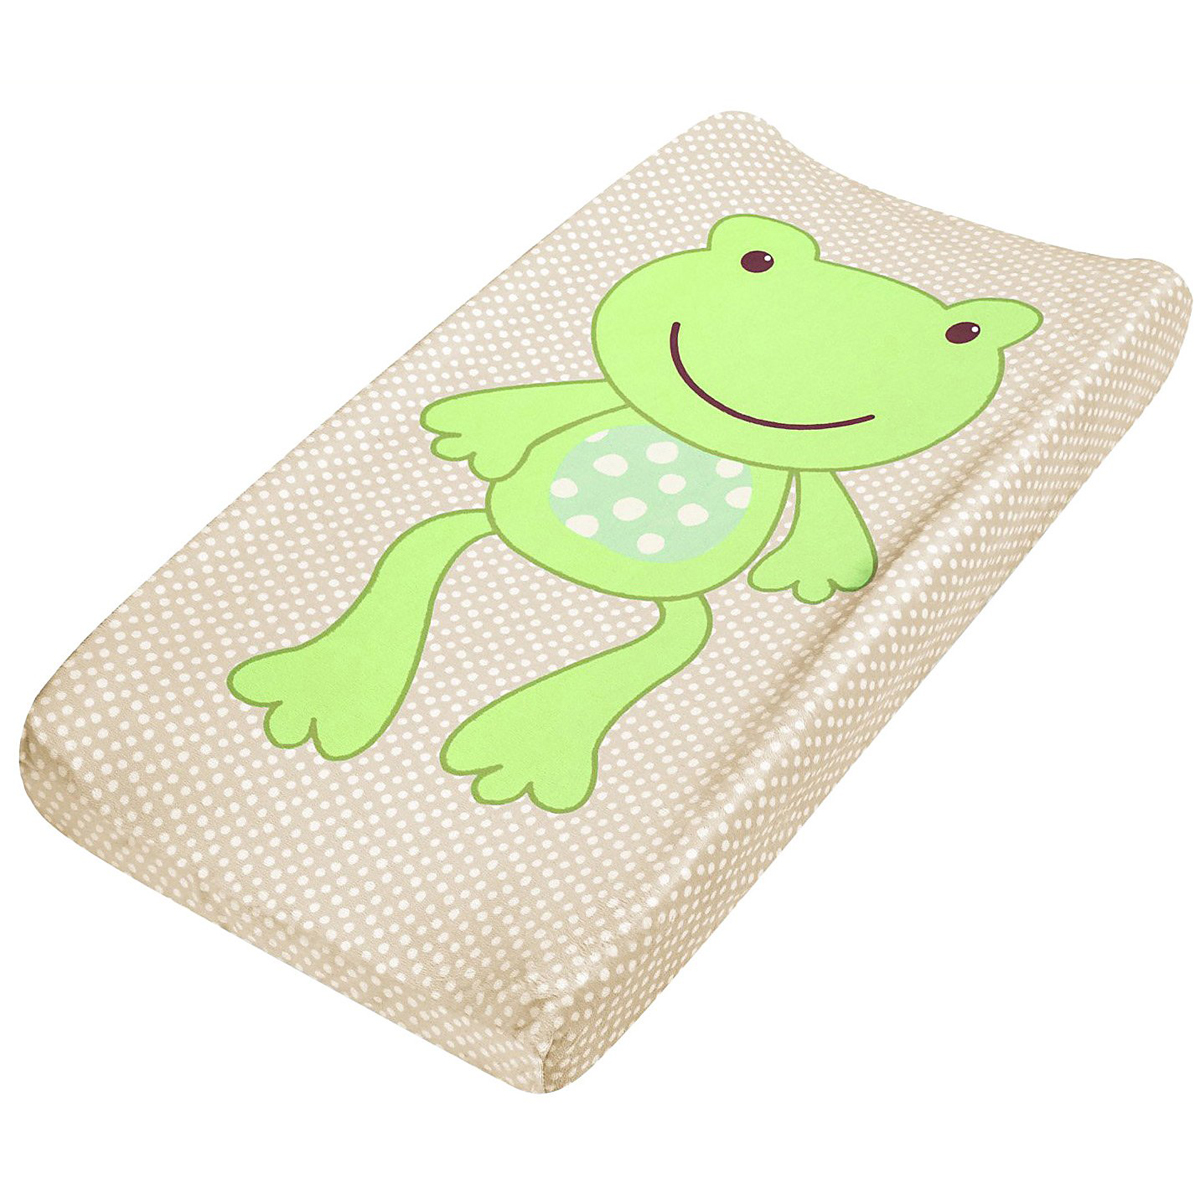 Ga boc dem thay ta Summer Frog xanh nhat